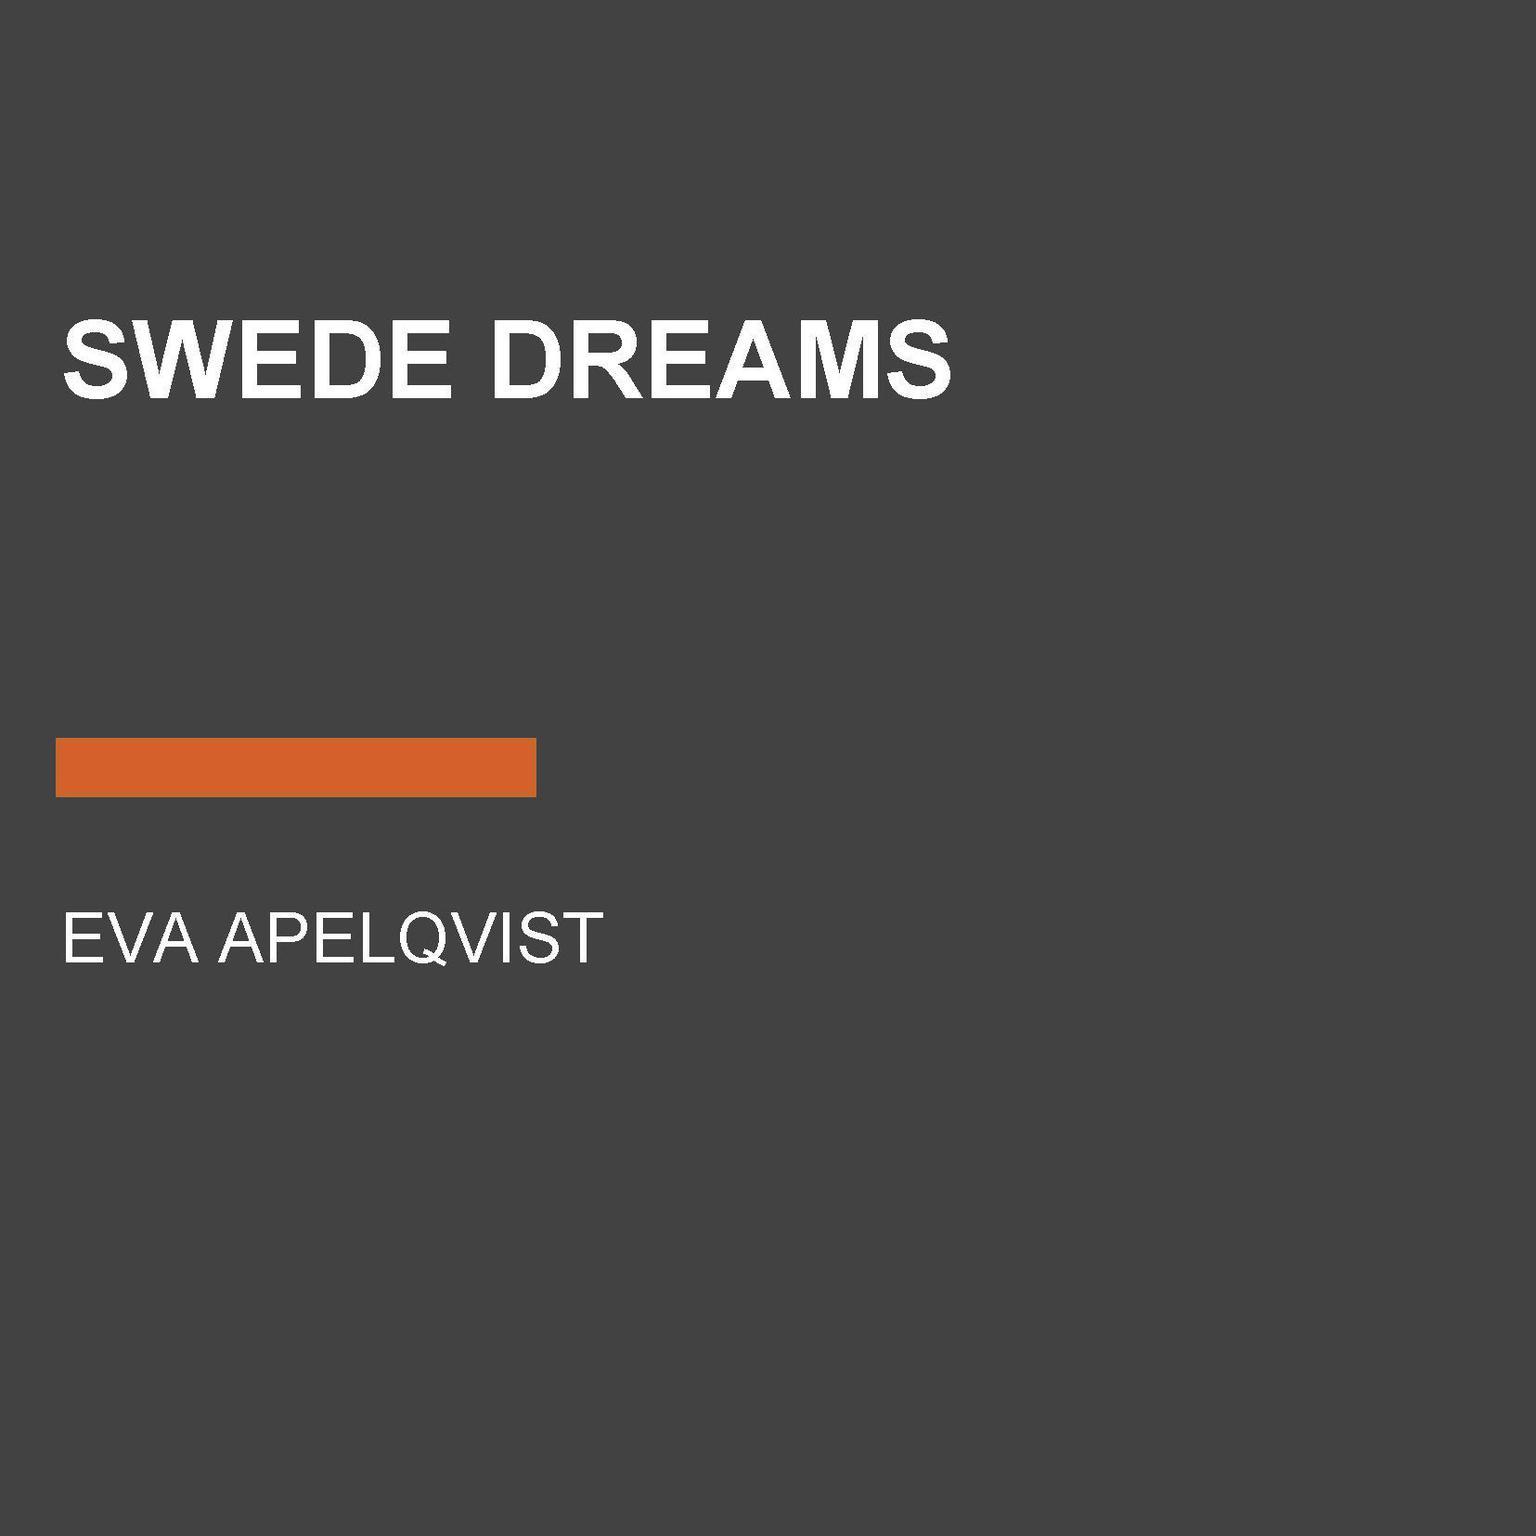 Swede Dreams Audiobook, by Eva Apelqvist